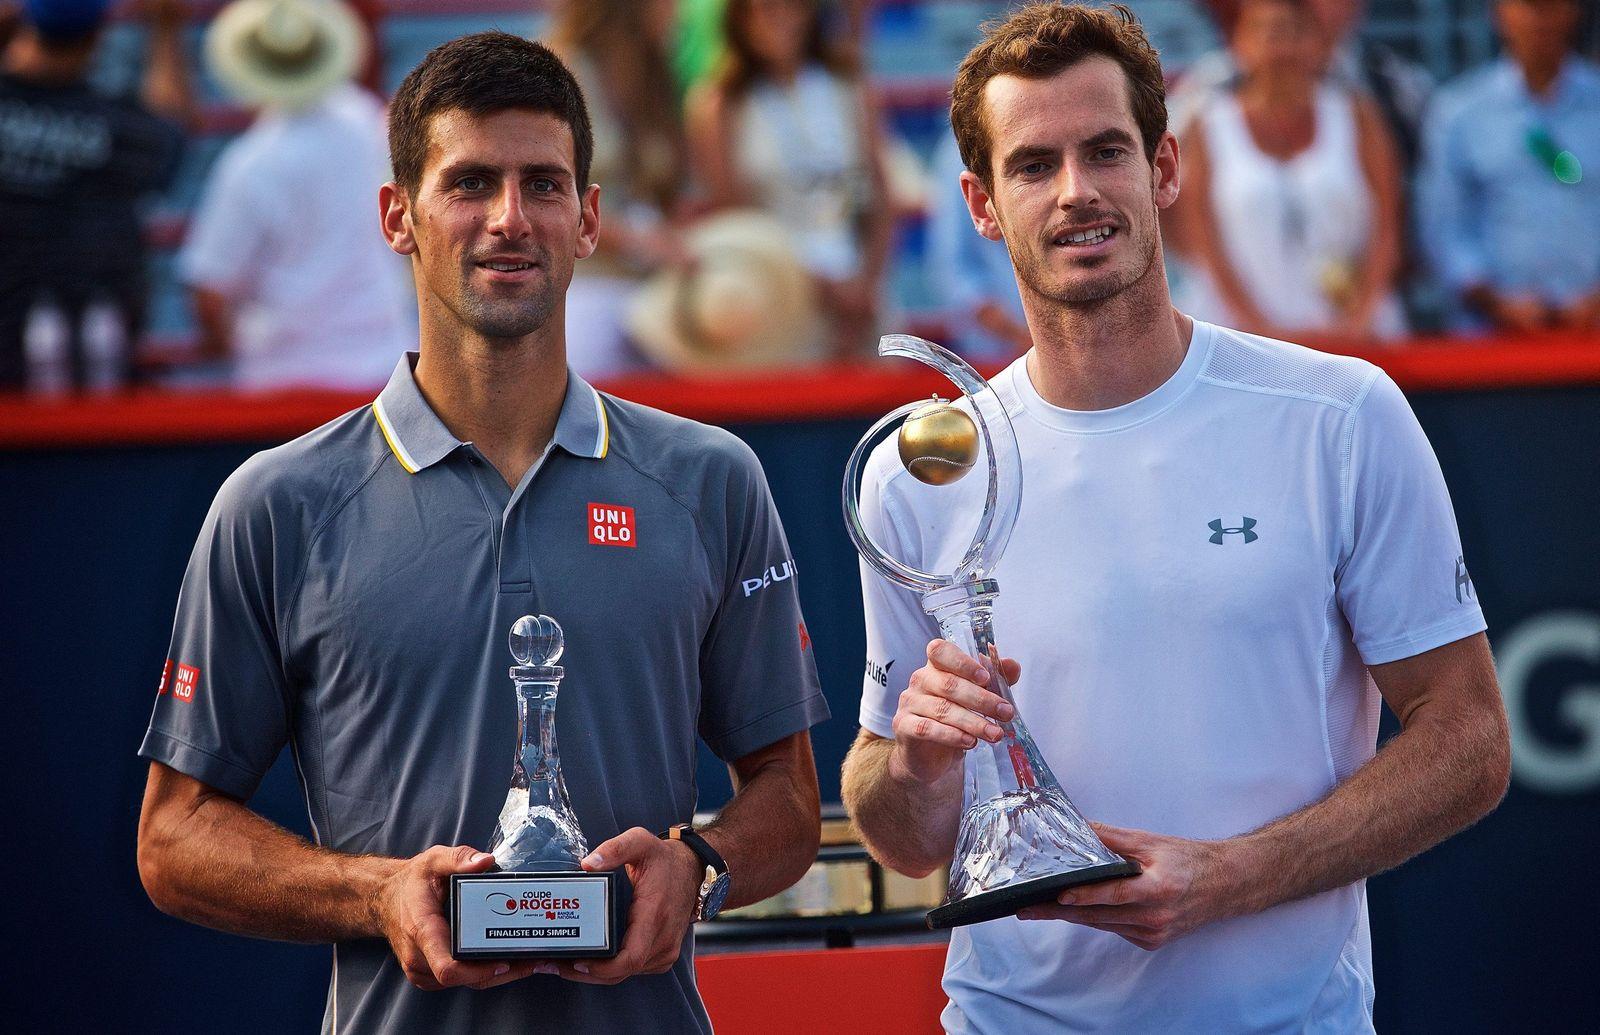 Andy Murray / Novak Djokovic